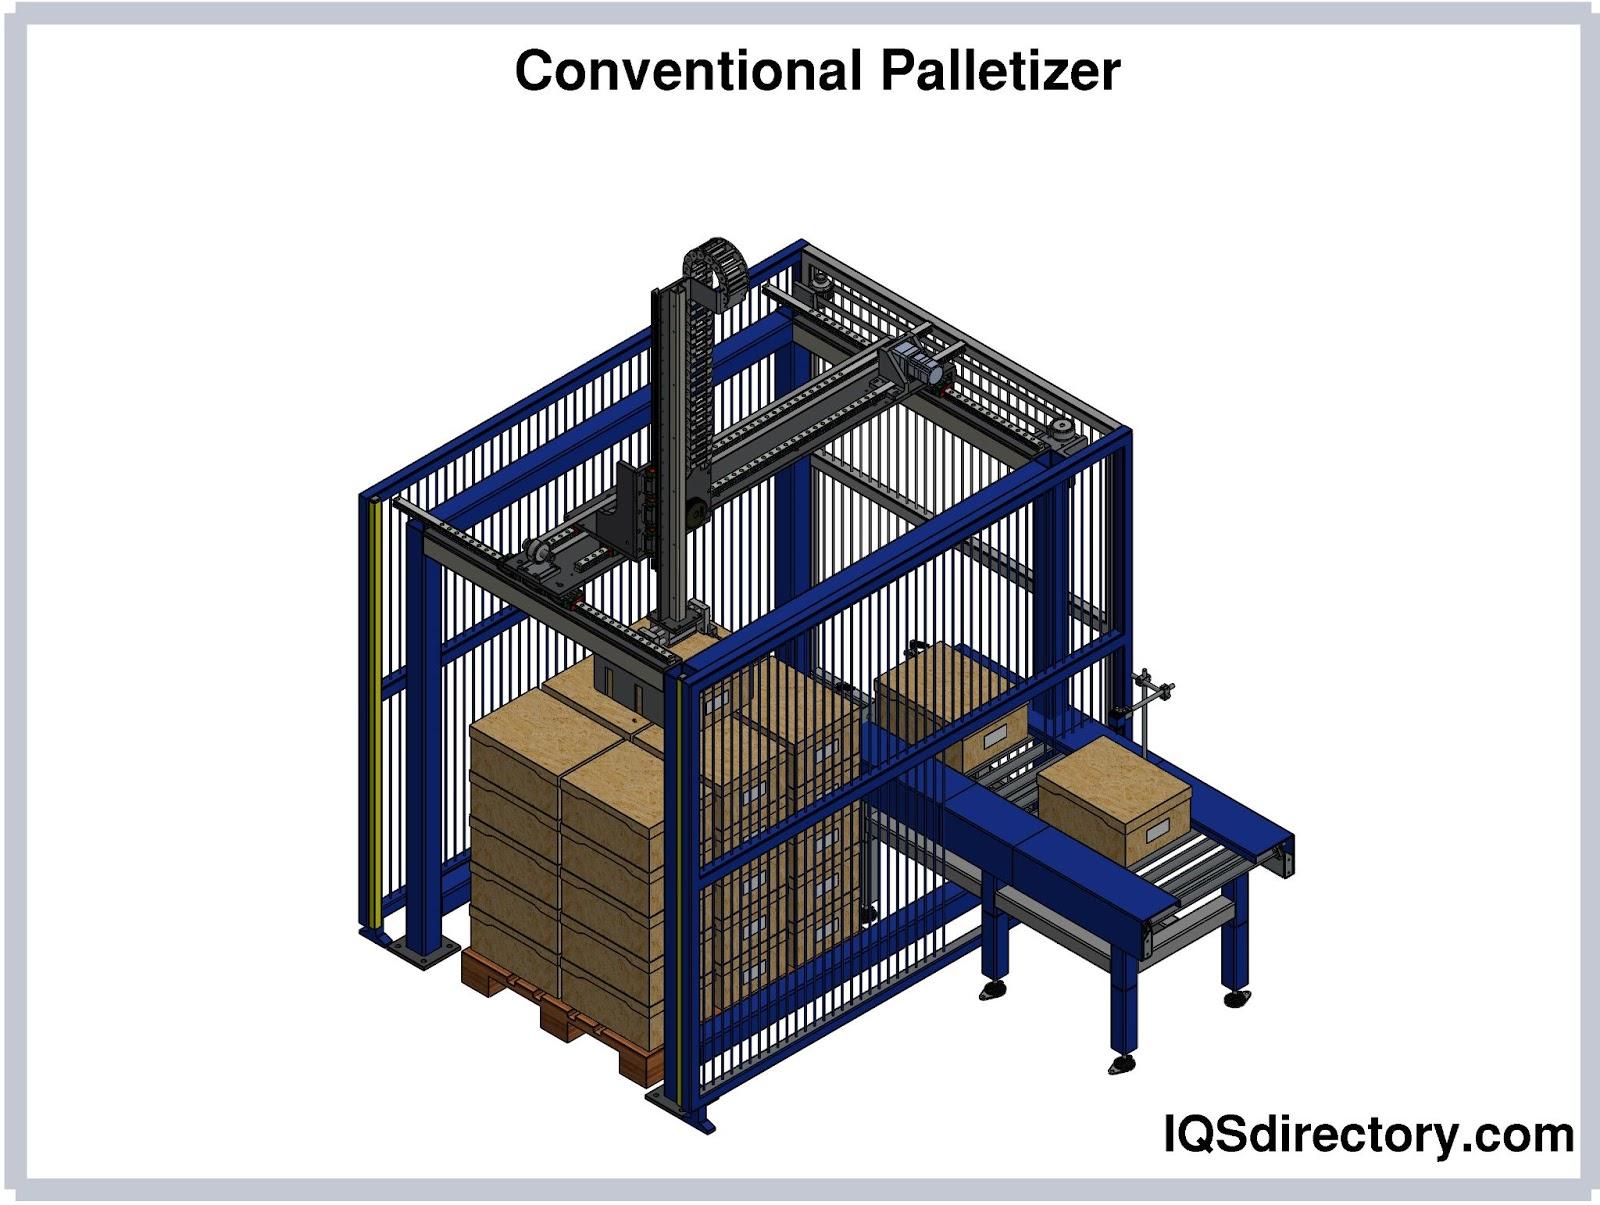 Conventional Palletizer